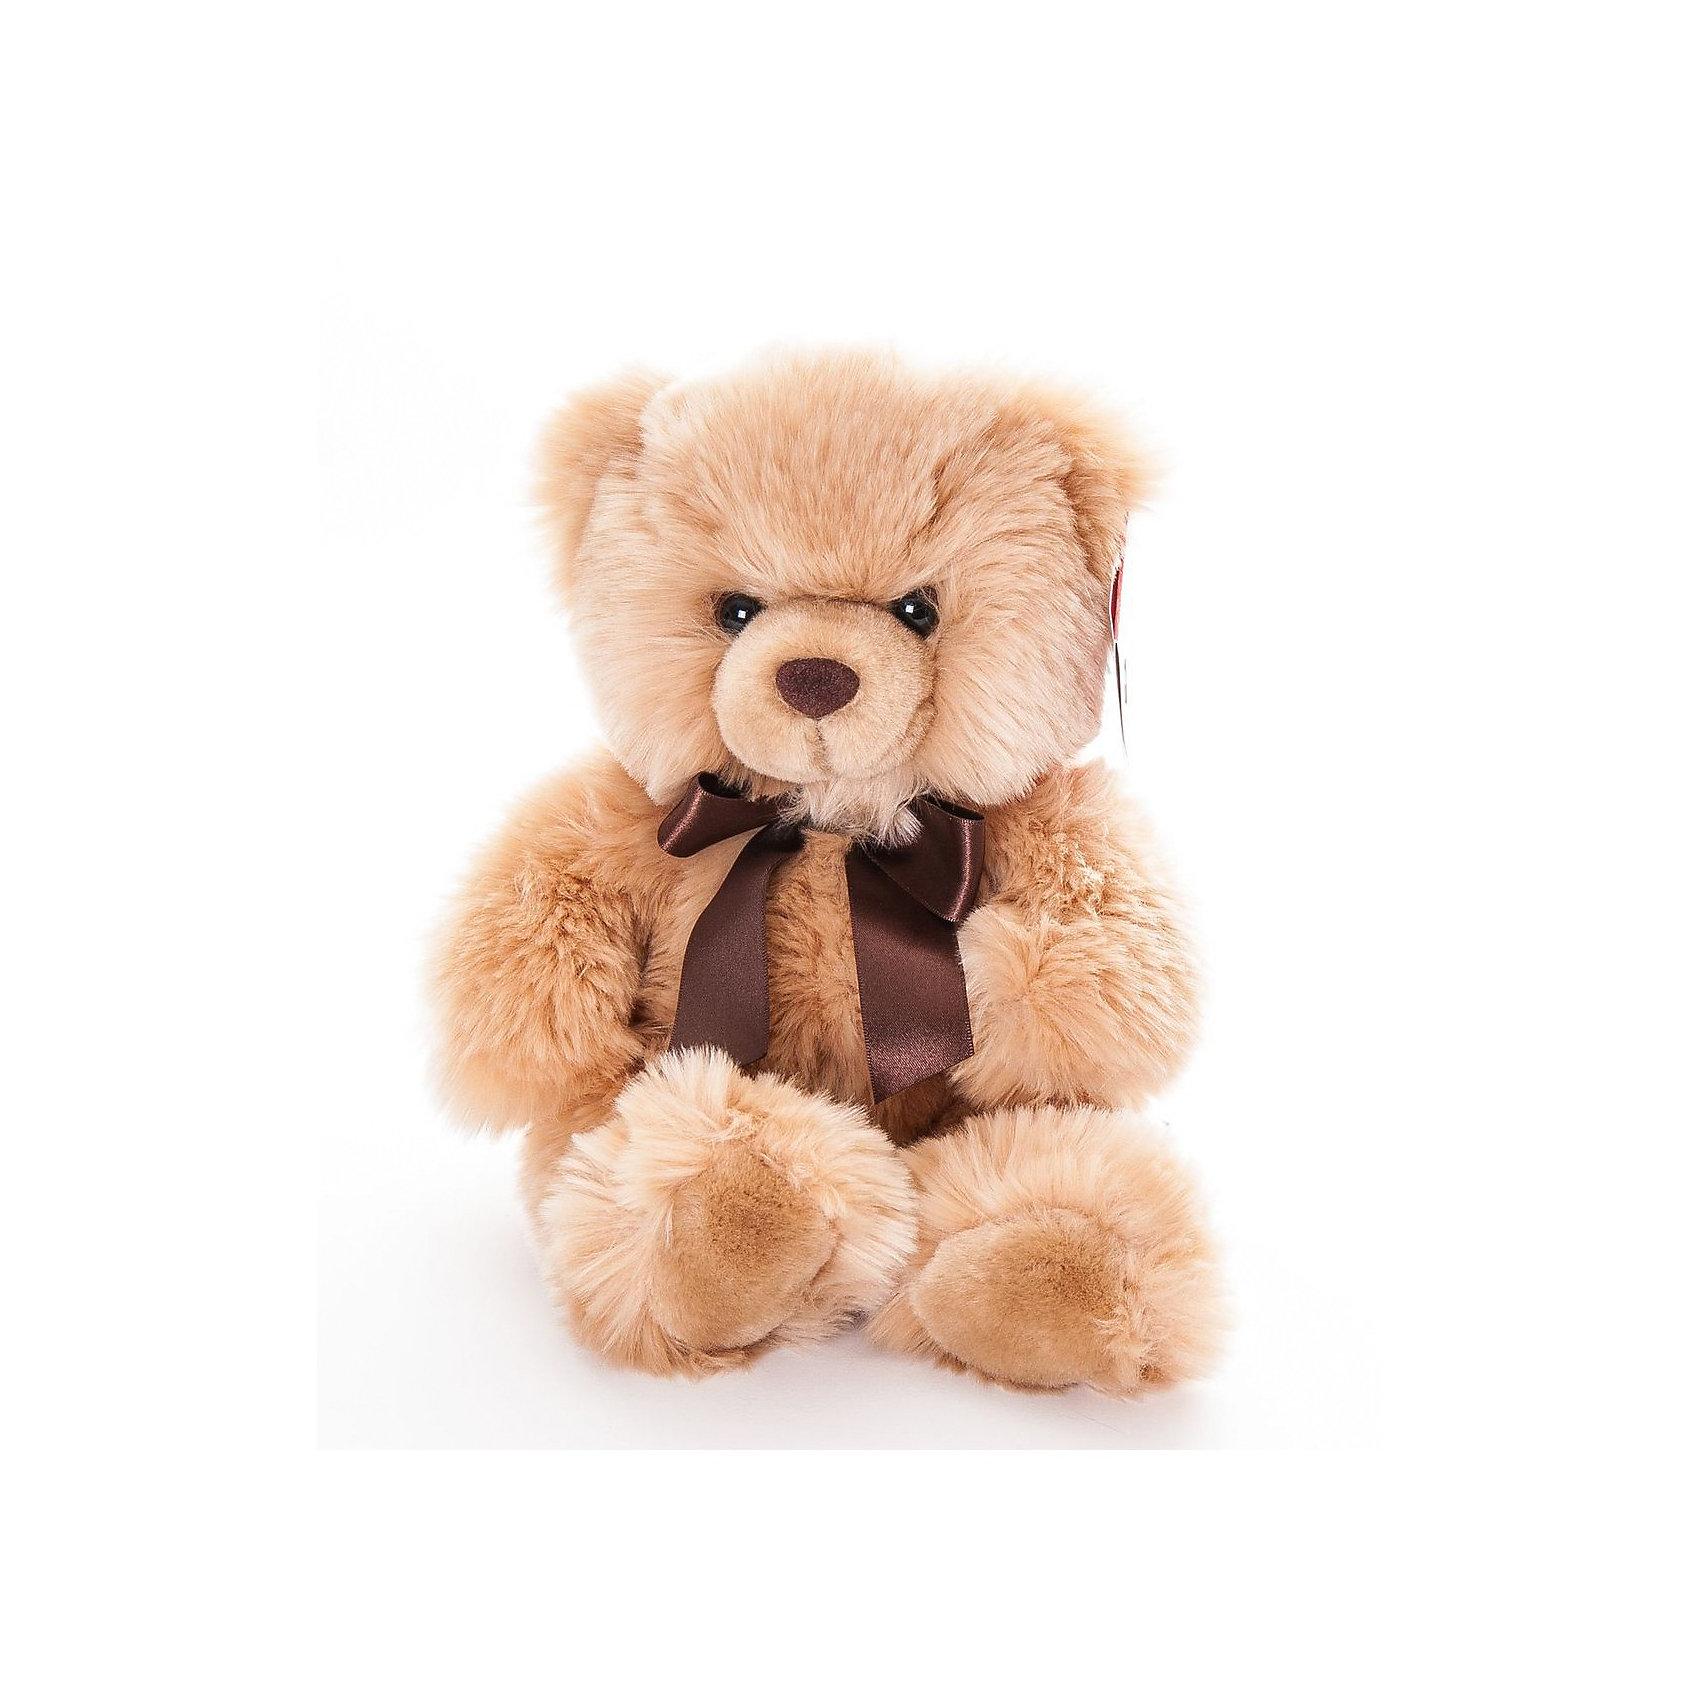 AURORA AURORA Мягкая игрушка Медведь, 30 см aurora мягкая игрушка тигр 28 см